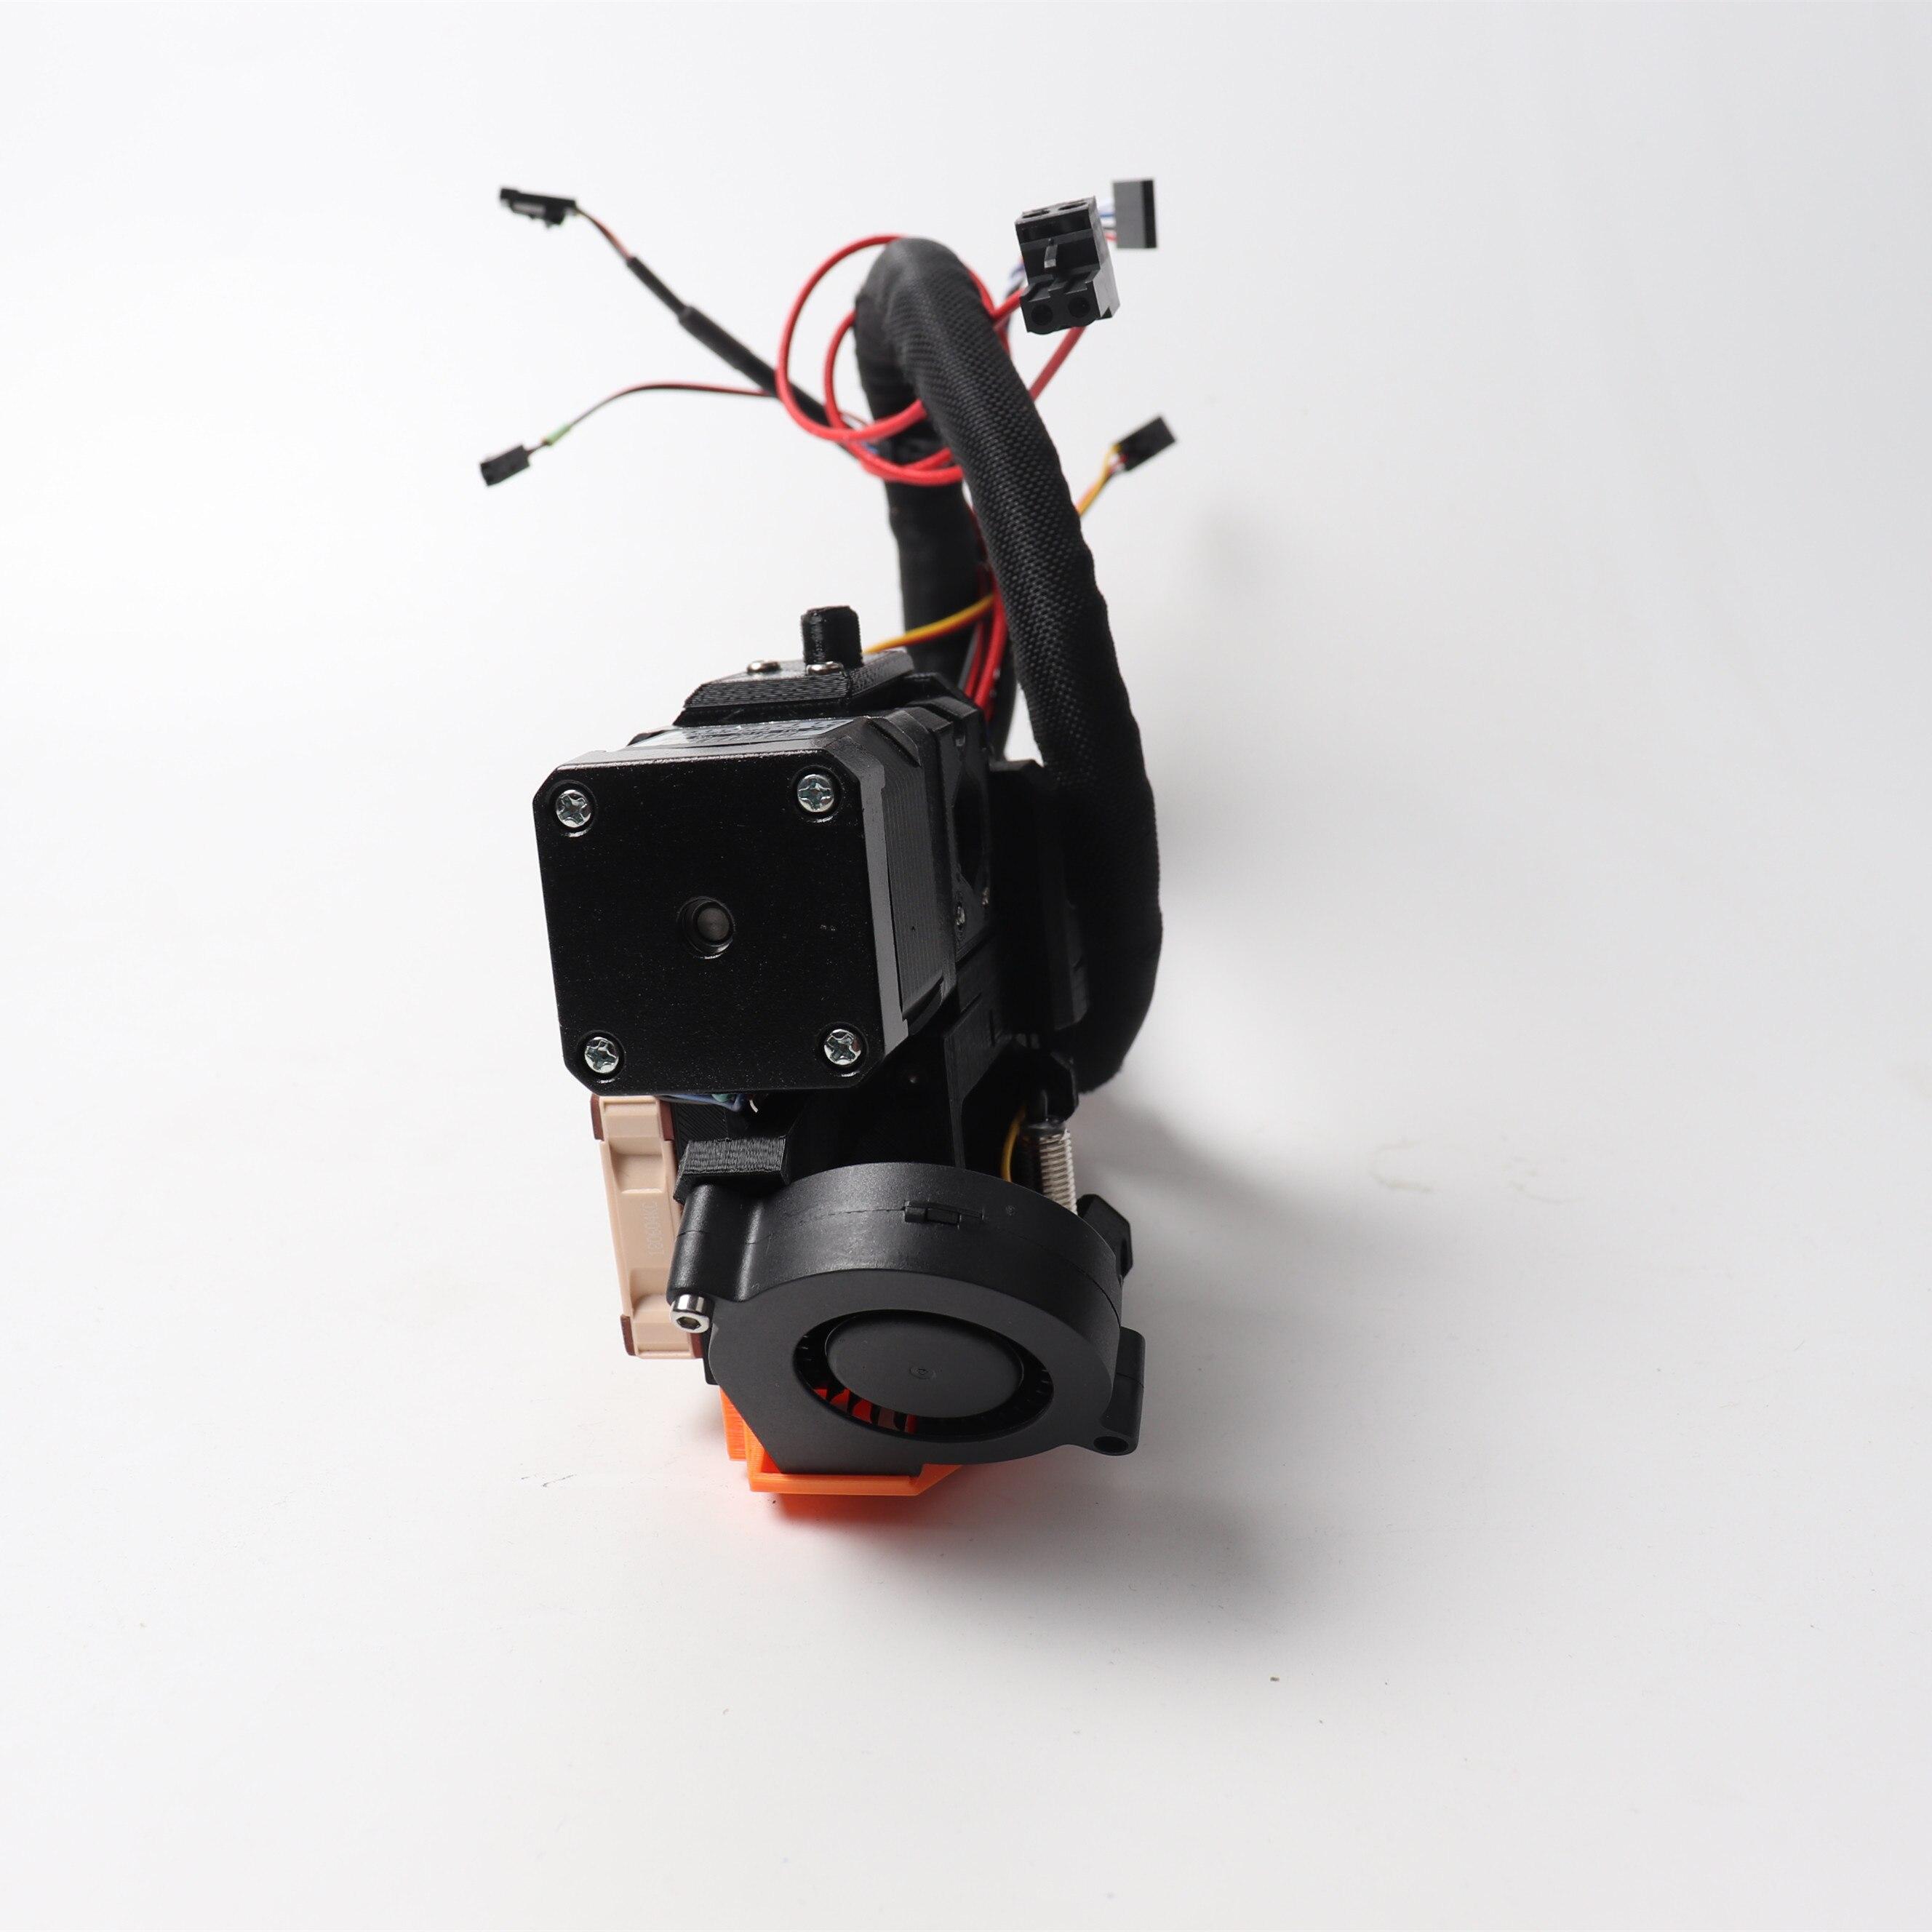 Image 3 - R3 Version !1Set Assembled Prusa i3 MK3  hotend kit 0.4MM nozzle Noctua fan, Pinda v2, filament sensor,textile-in 3D Printer Parts & Accessories from Computer & Office